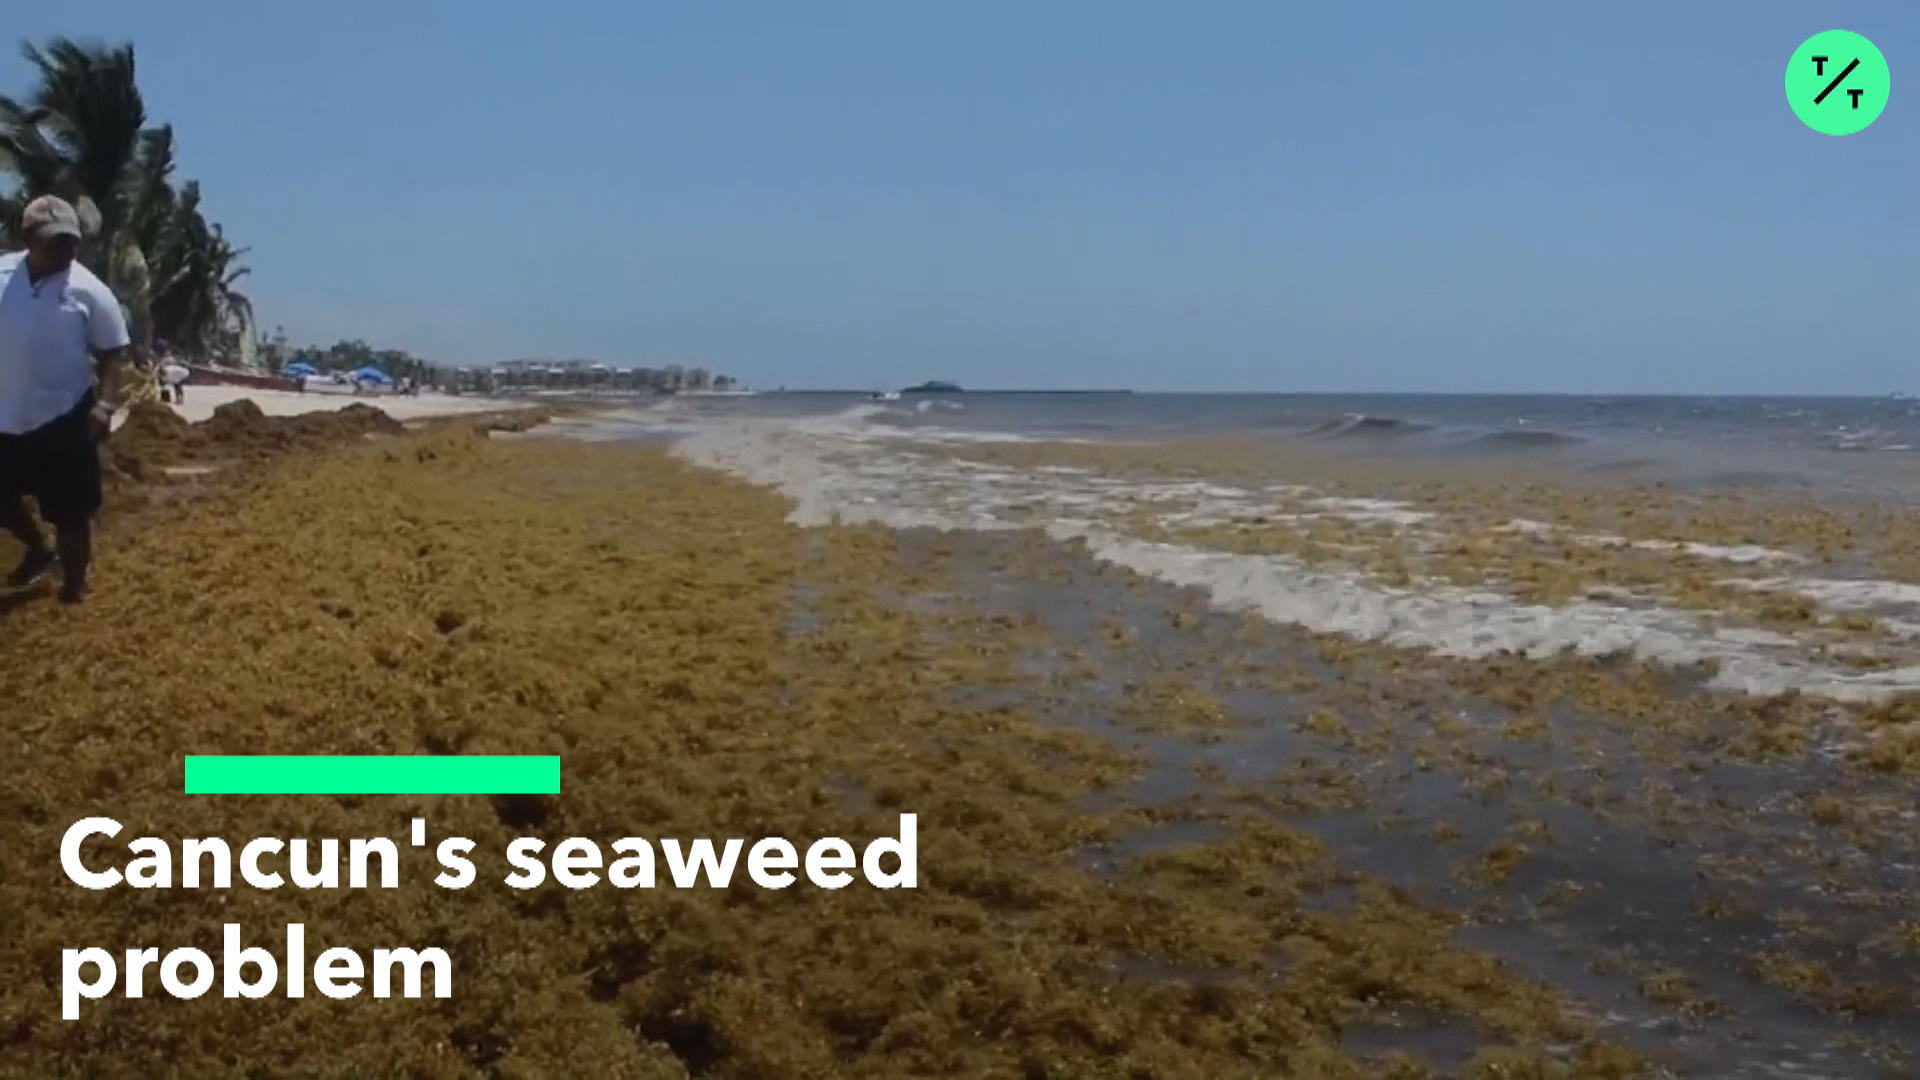 Cancun Seaweed 2019: Airport, Hotels, Beaches See Fewer